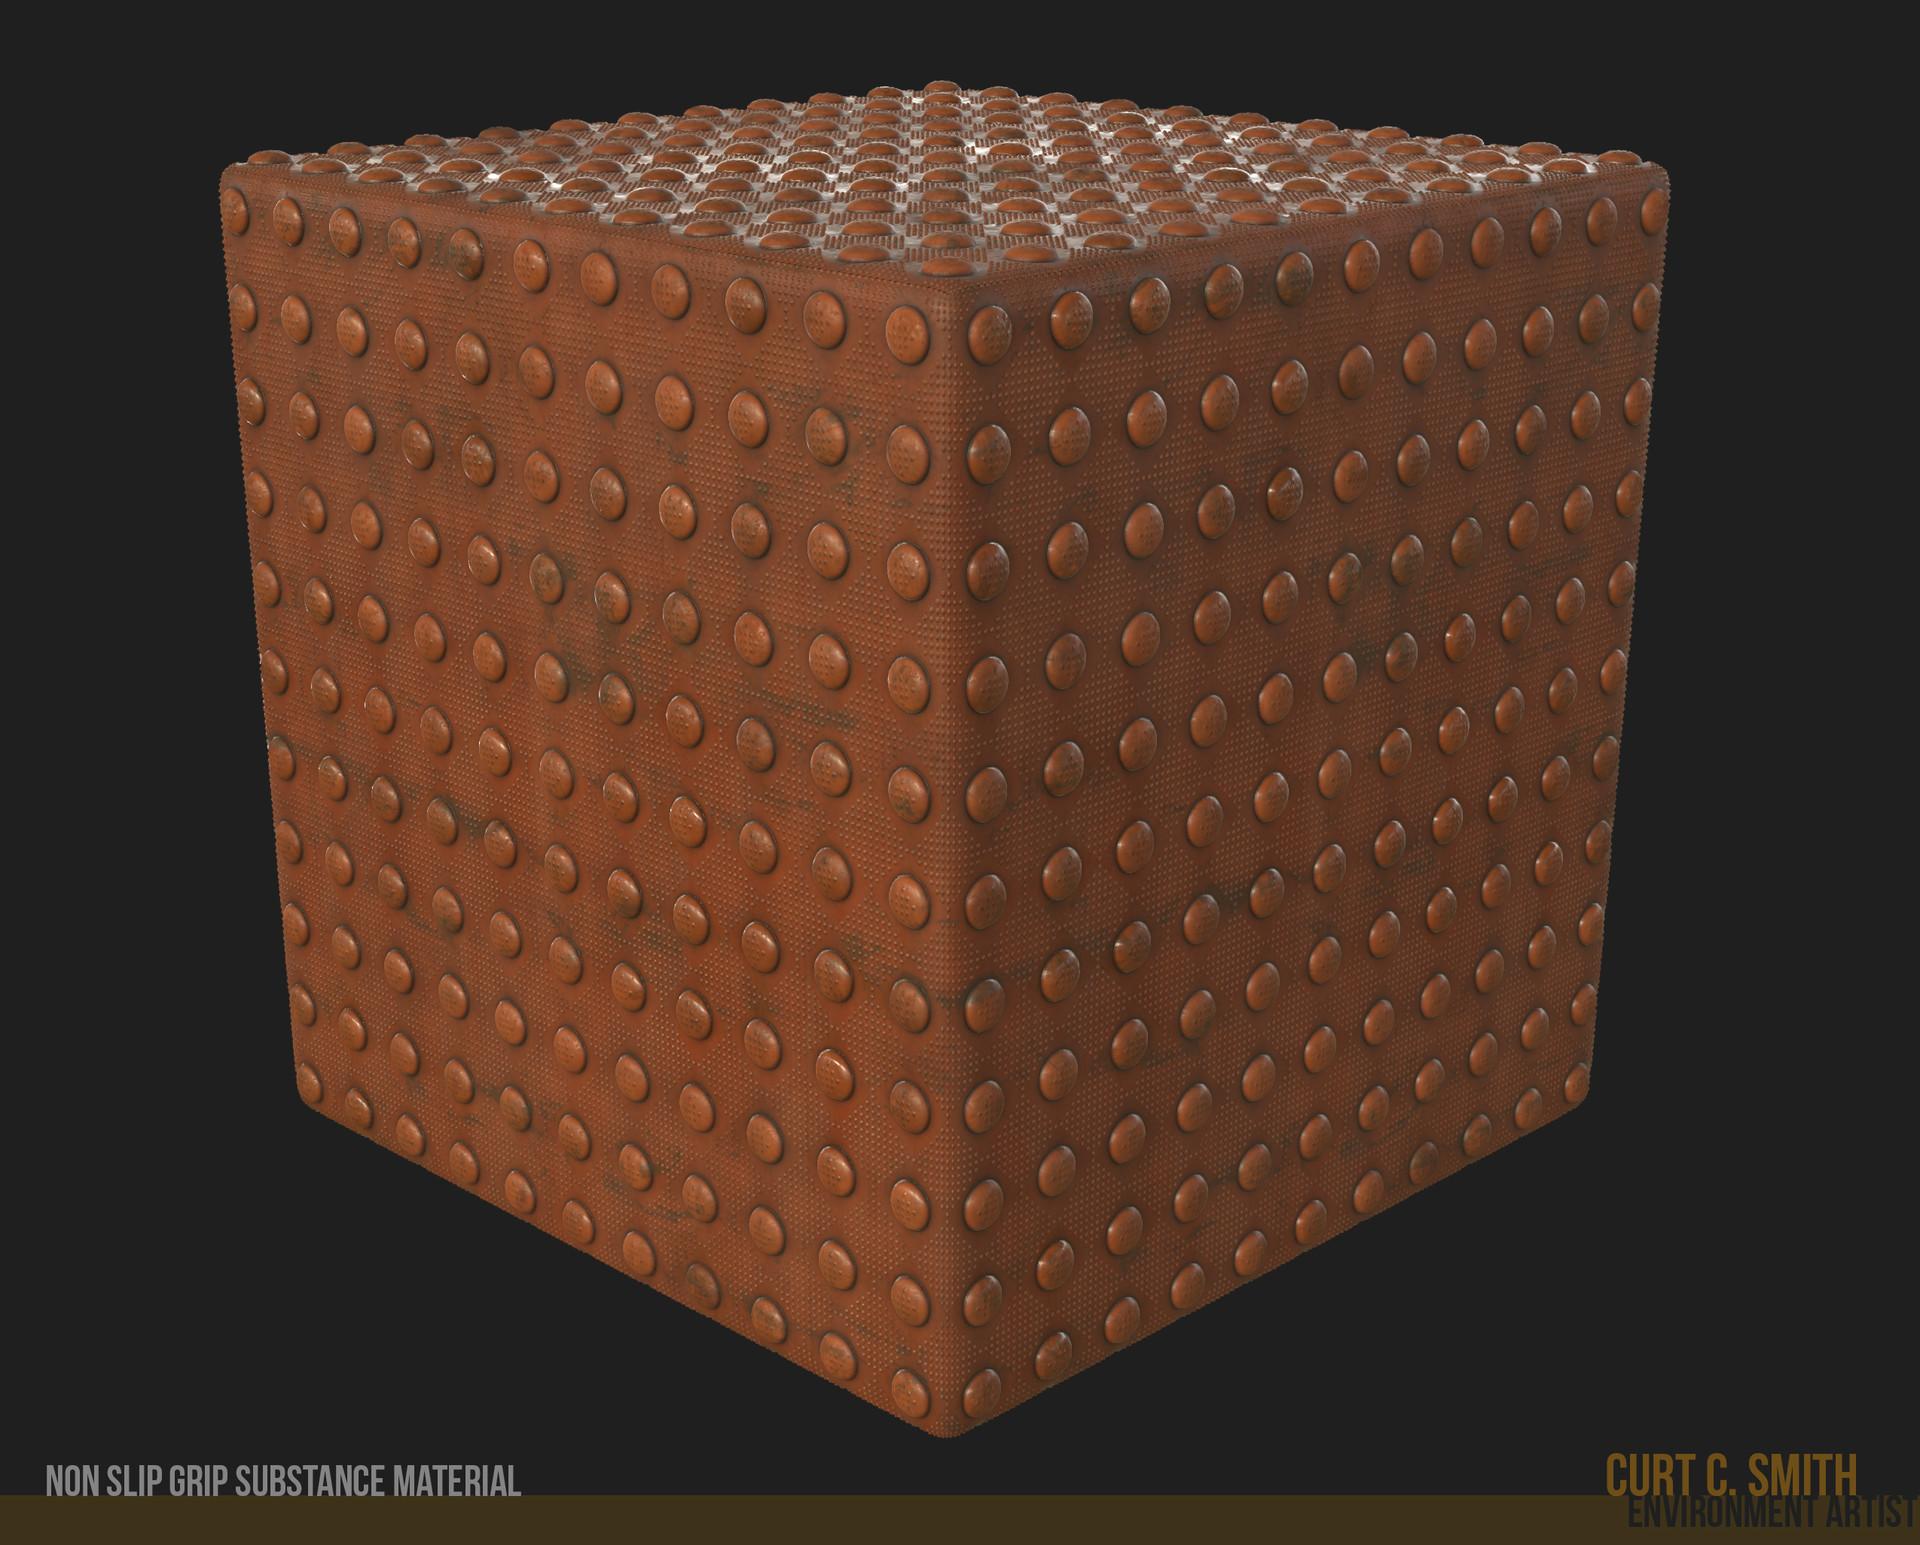 ArtStation - Non-Slip Grip Substance Material, Curt C. Smith